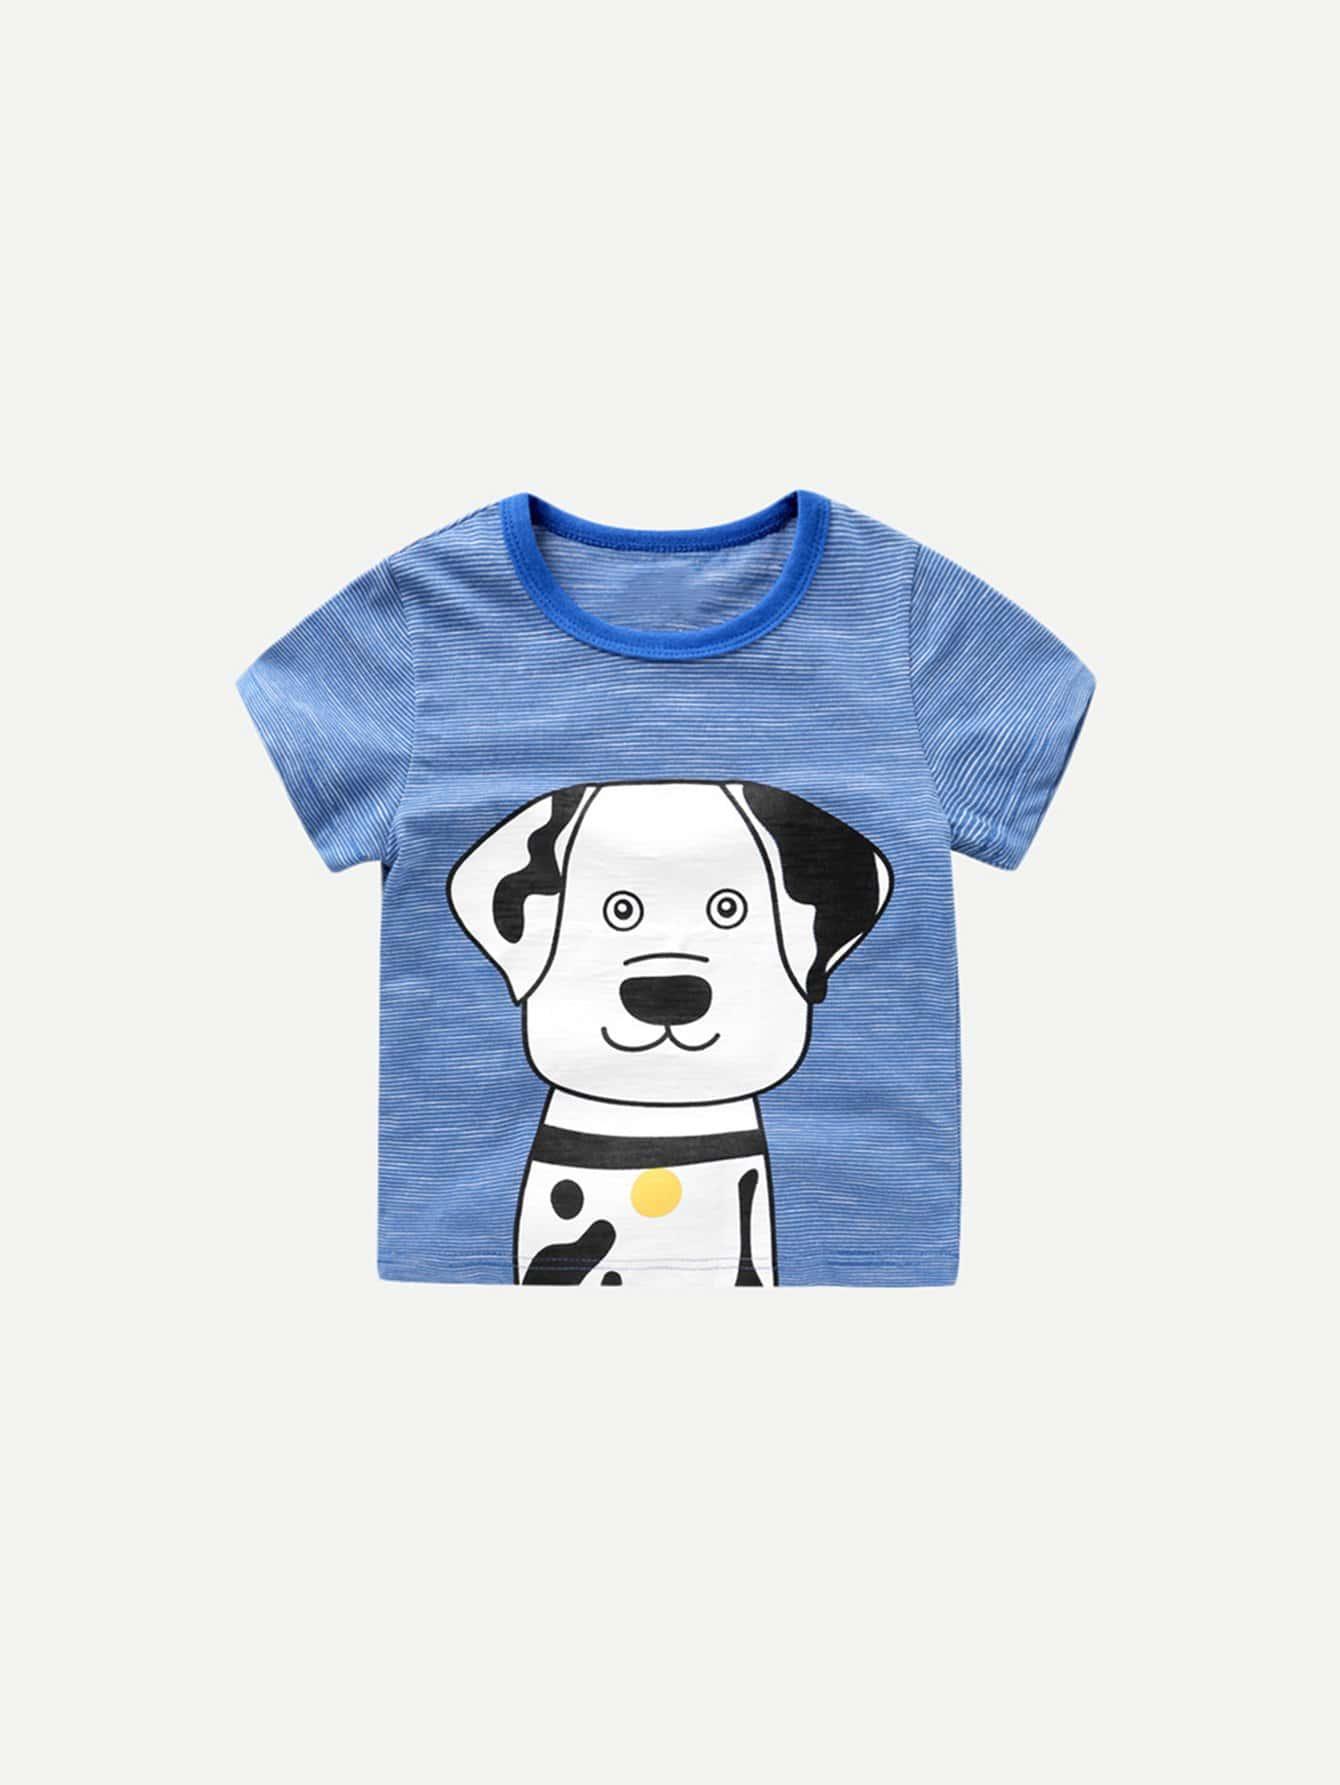 Boys Dog Print Striped Tee boys tee